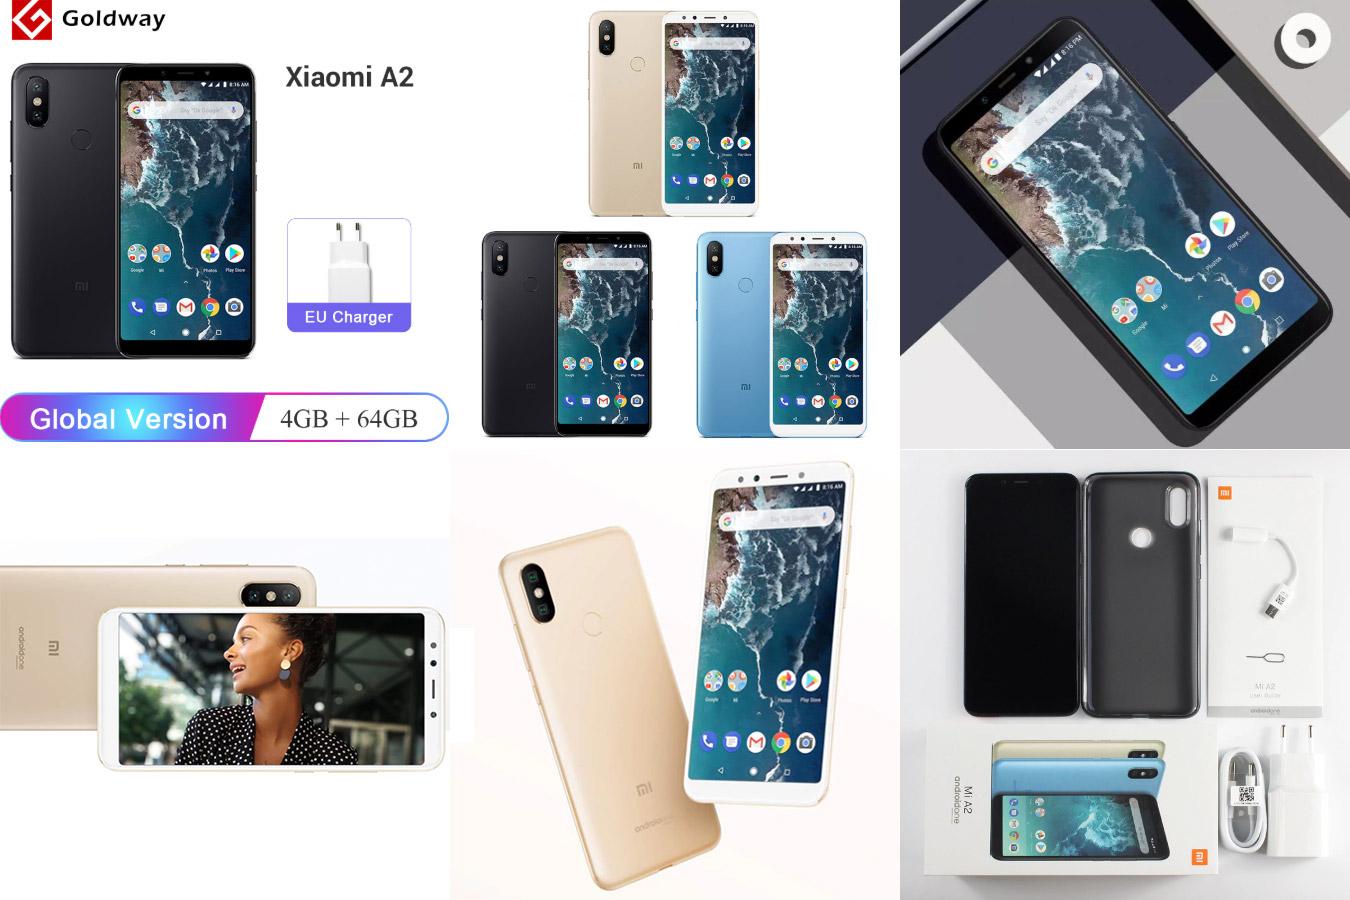 Смартфон Xiaomi Mi A2 с алиэкспресс